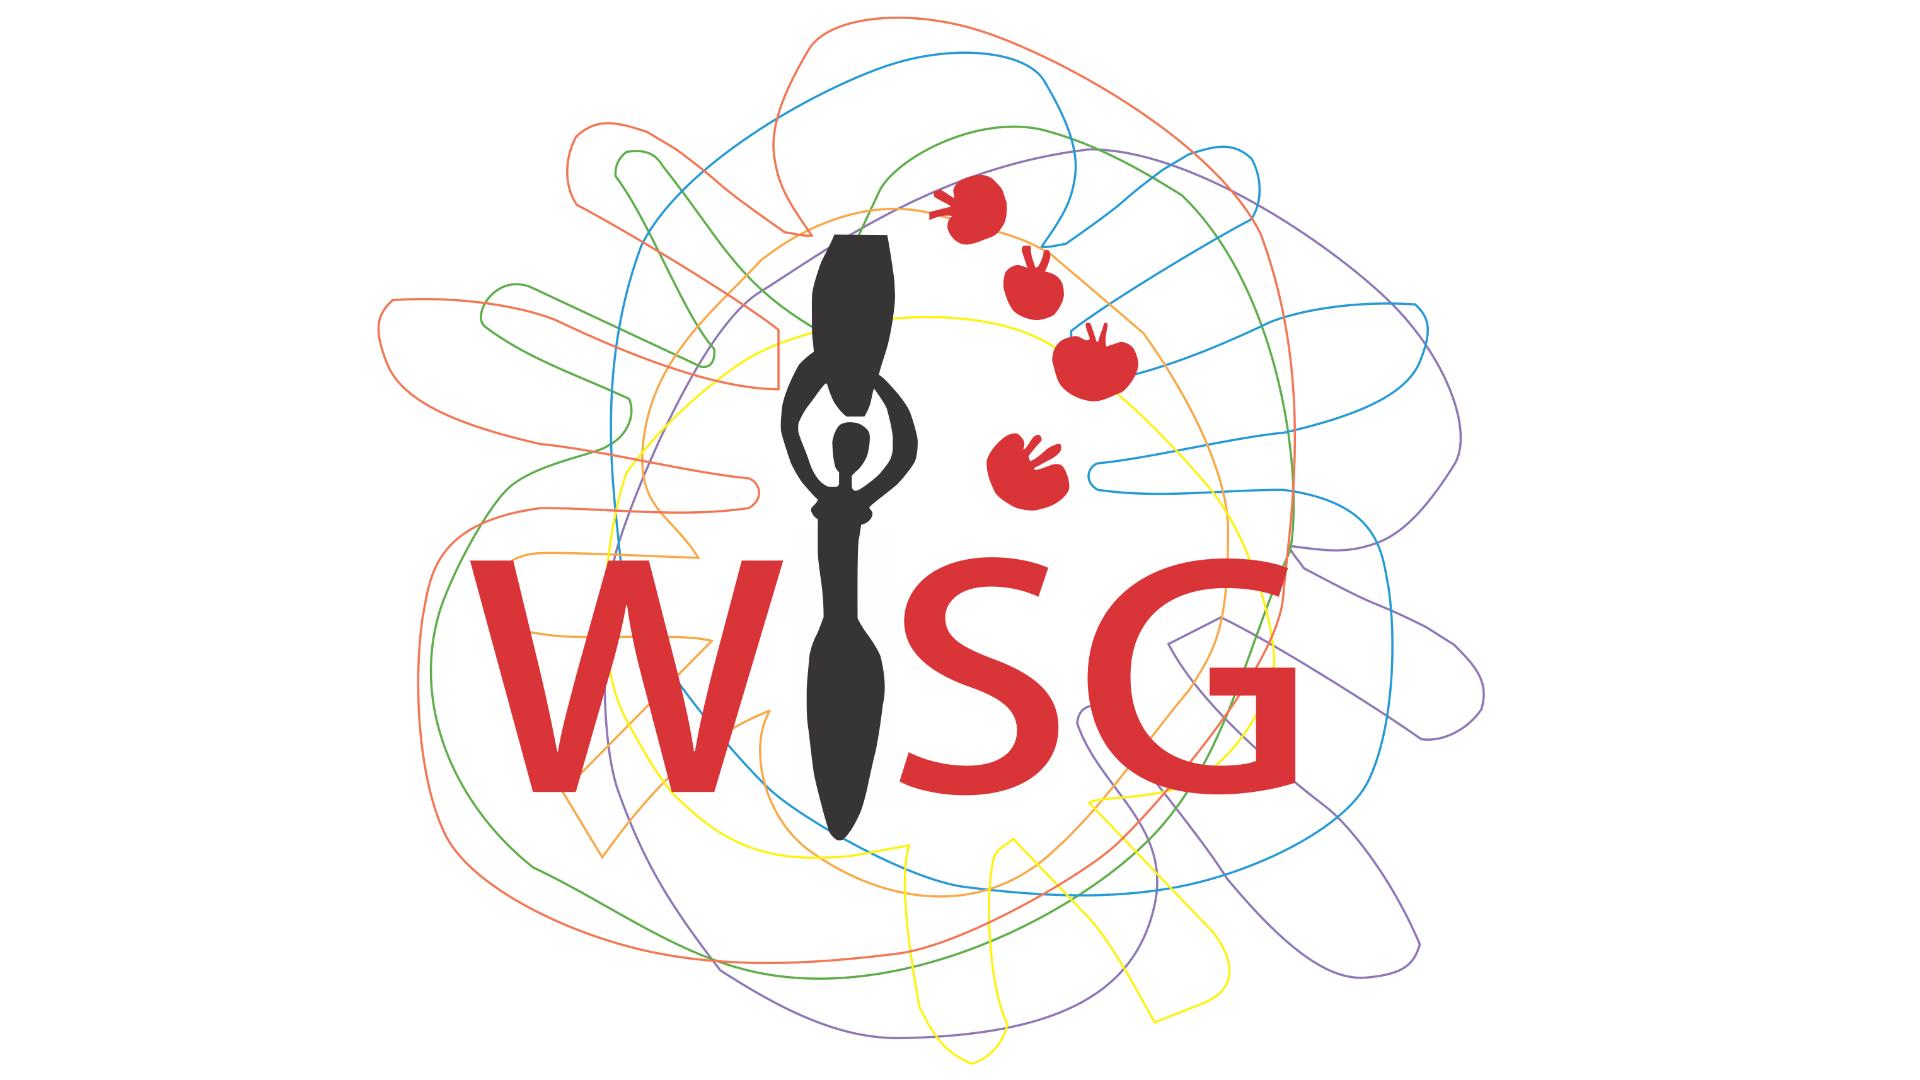 WISG მიმართავს სახელმწიფო უწყებებს კორონავირუსის გავრცელებასთან დაკავშირებული მდგომარეობის შესახებ